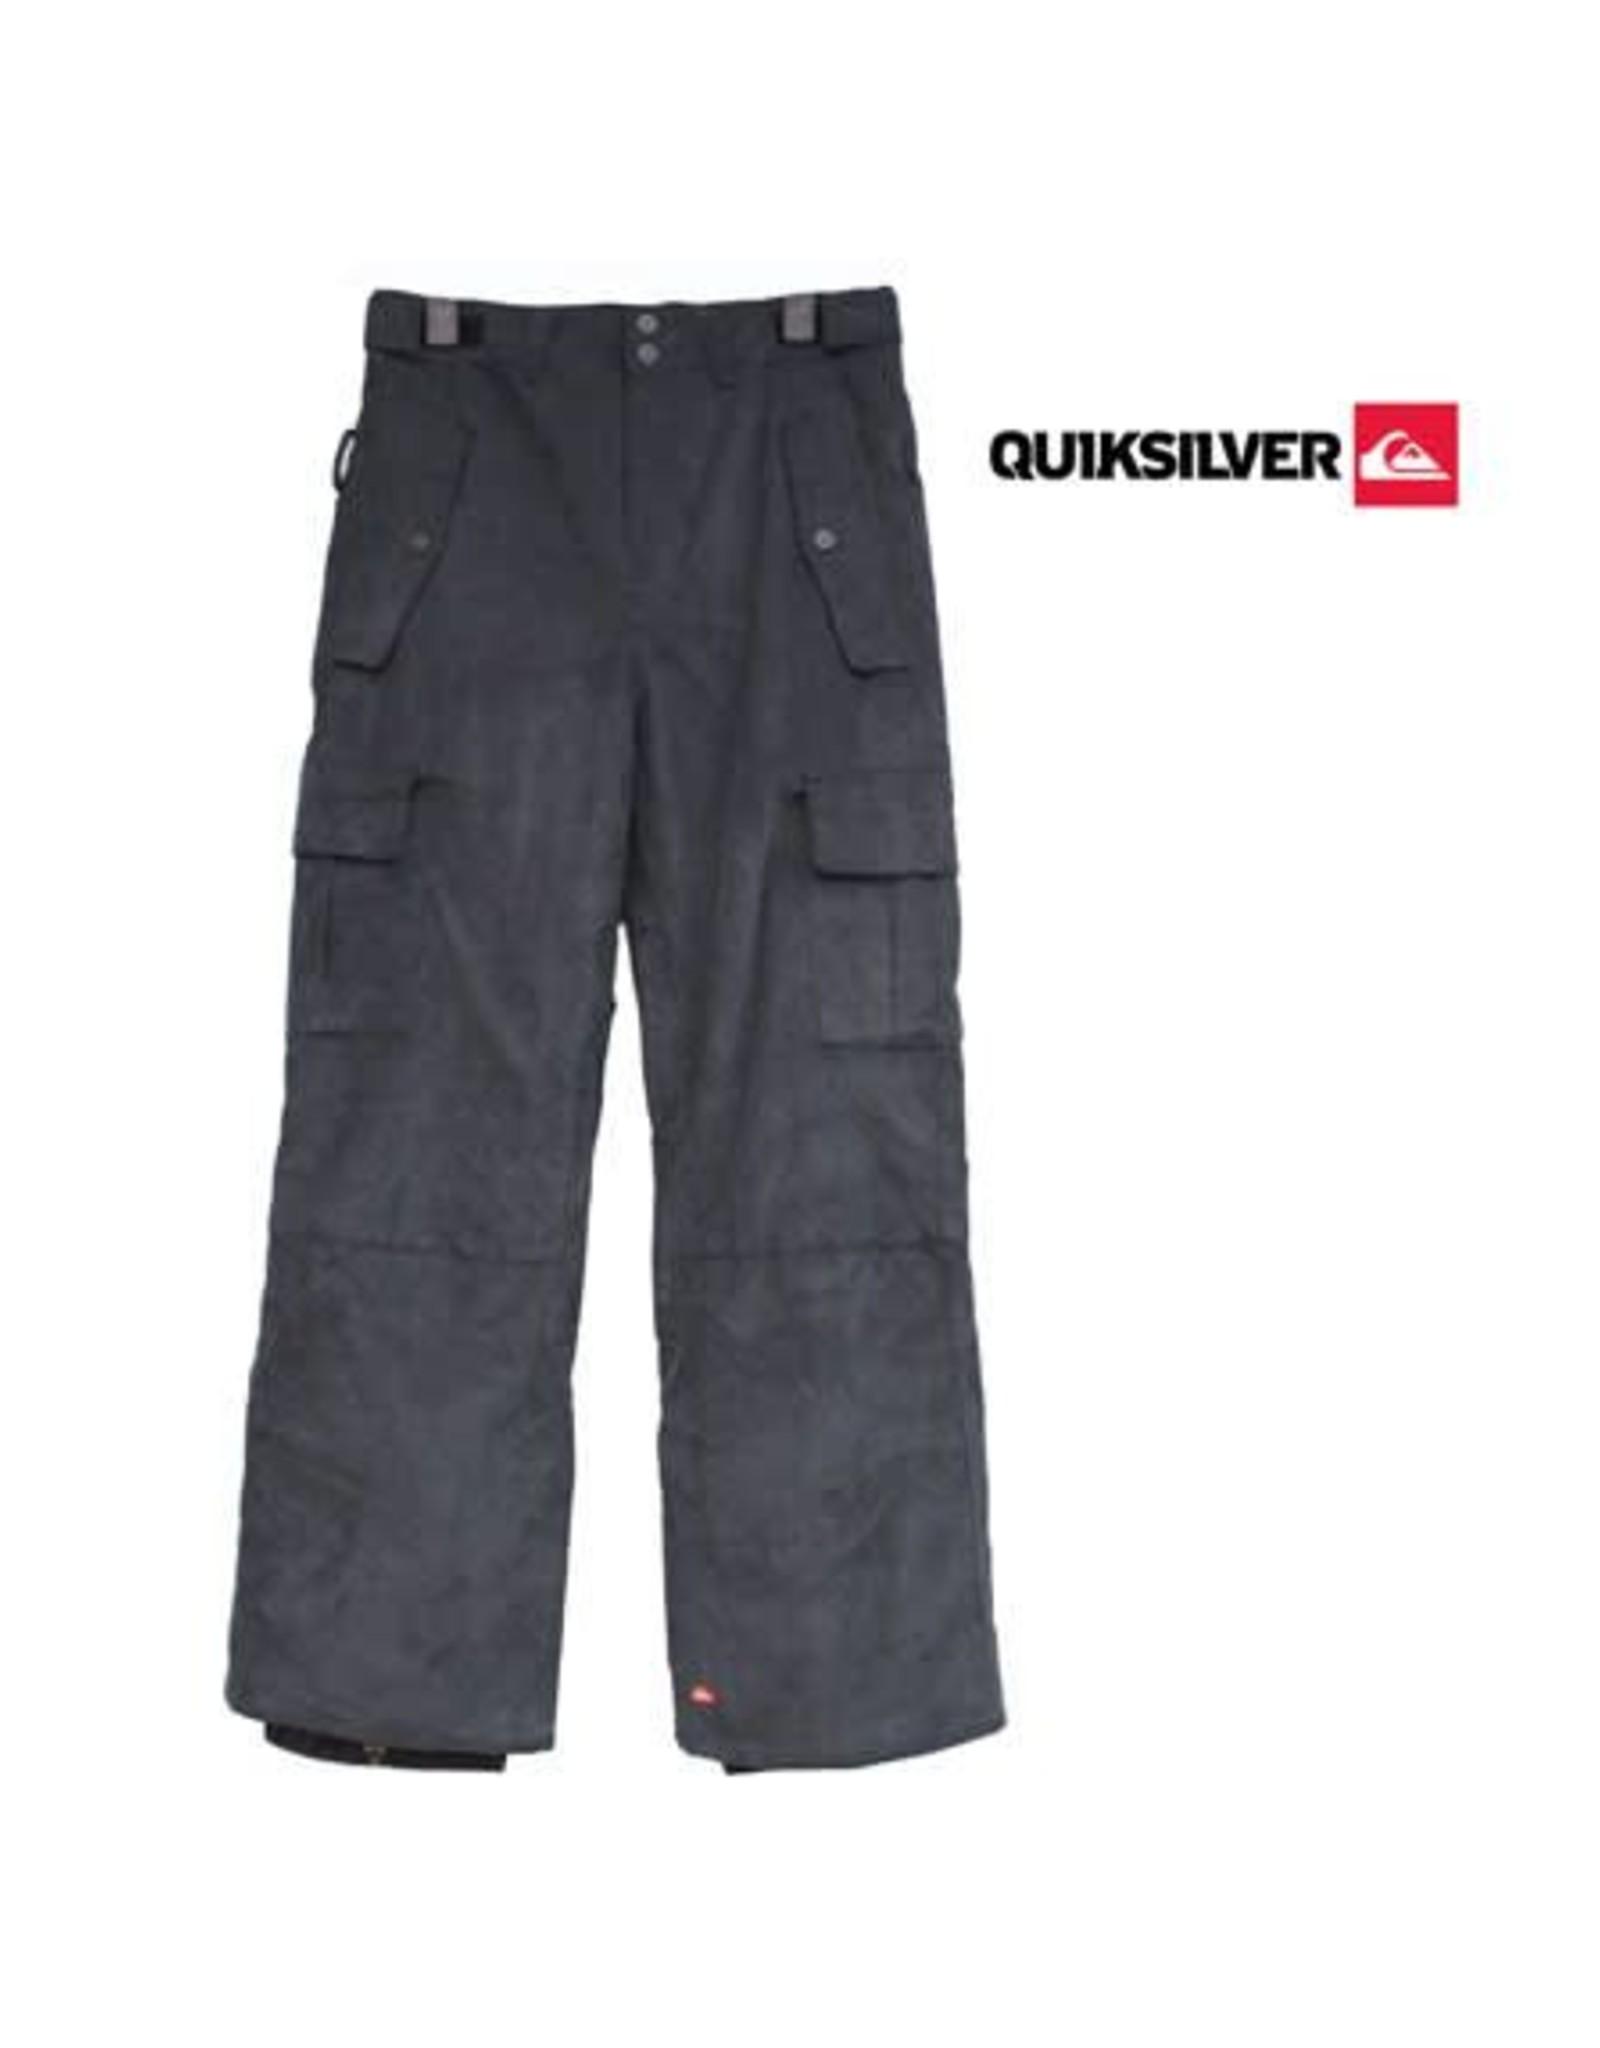 QUIKSILVER Quiksilver SKIBROEK Sherpa Fancy Corduroy Youth Zwart /  Corduroy mt 134